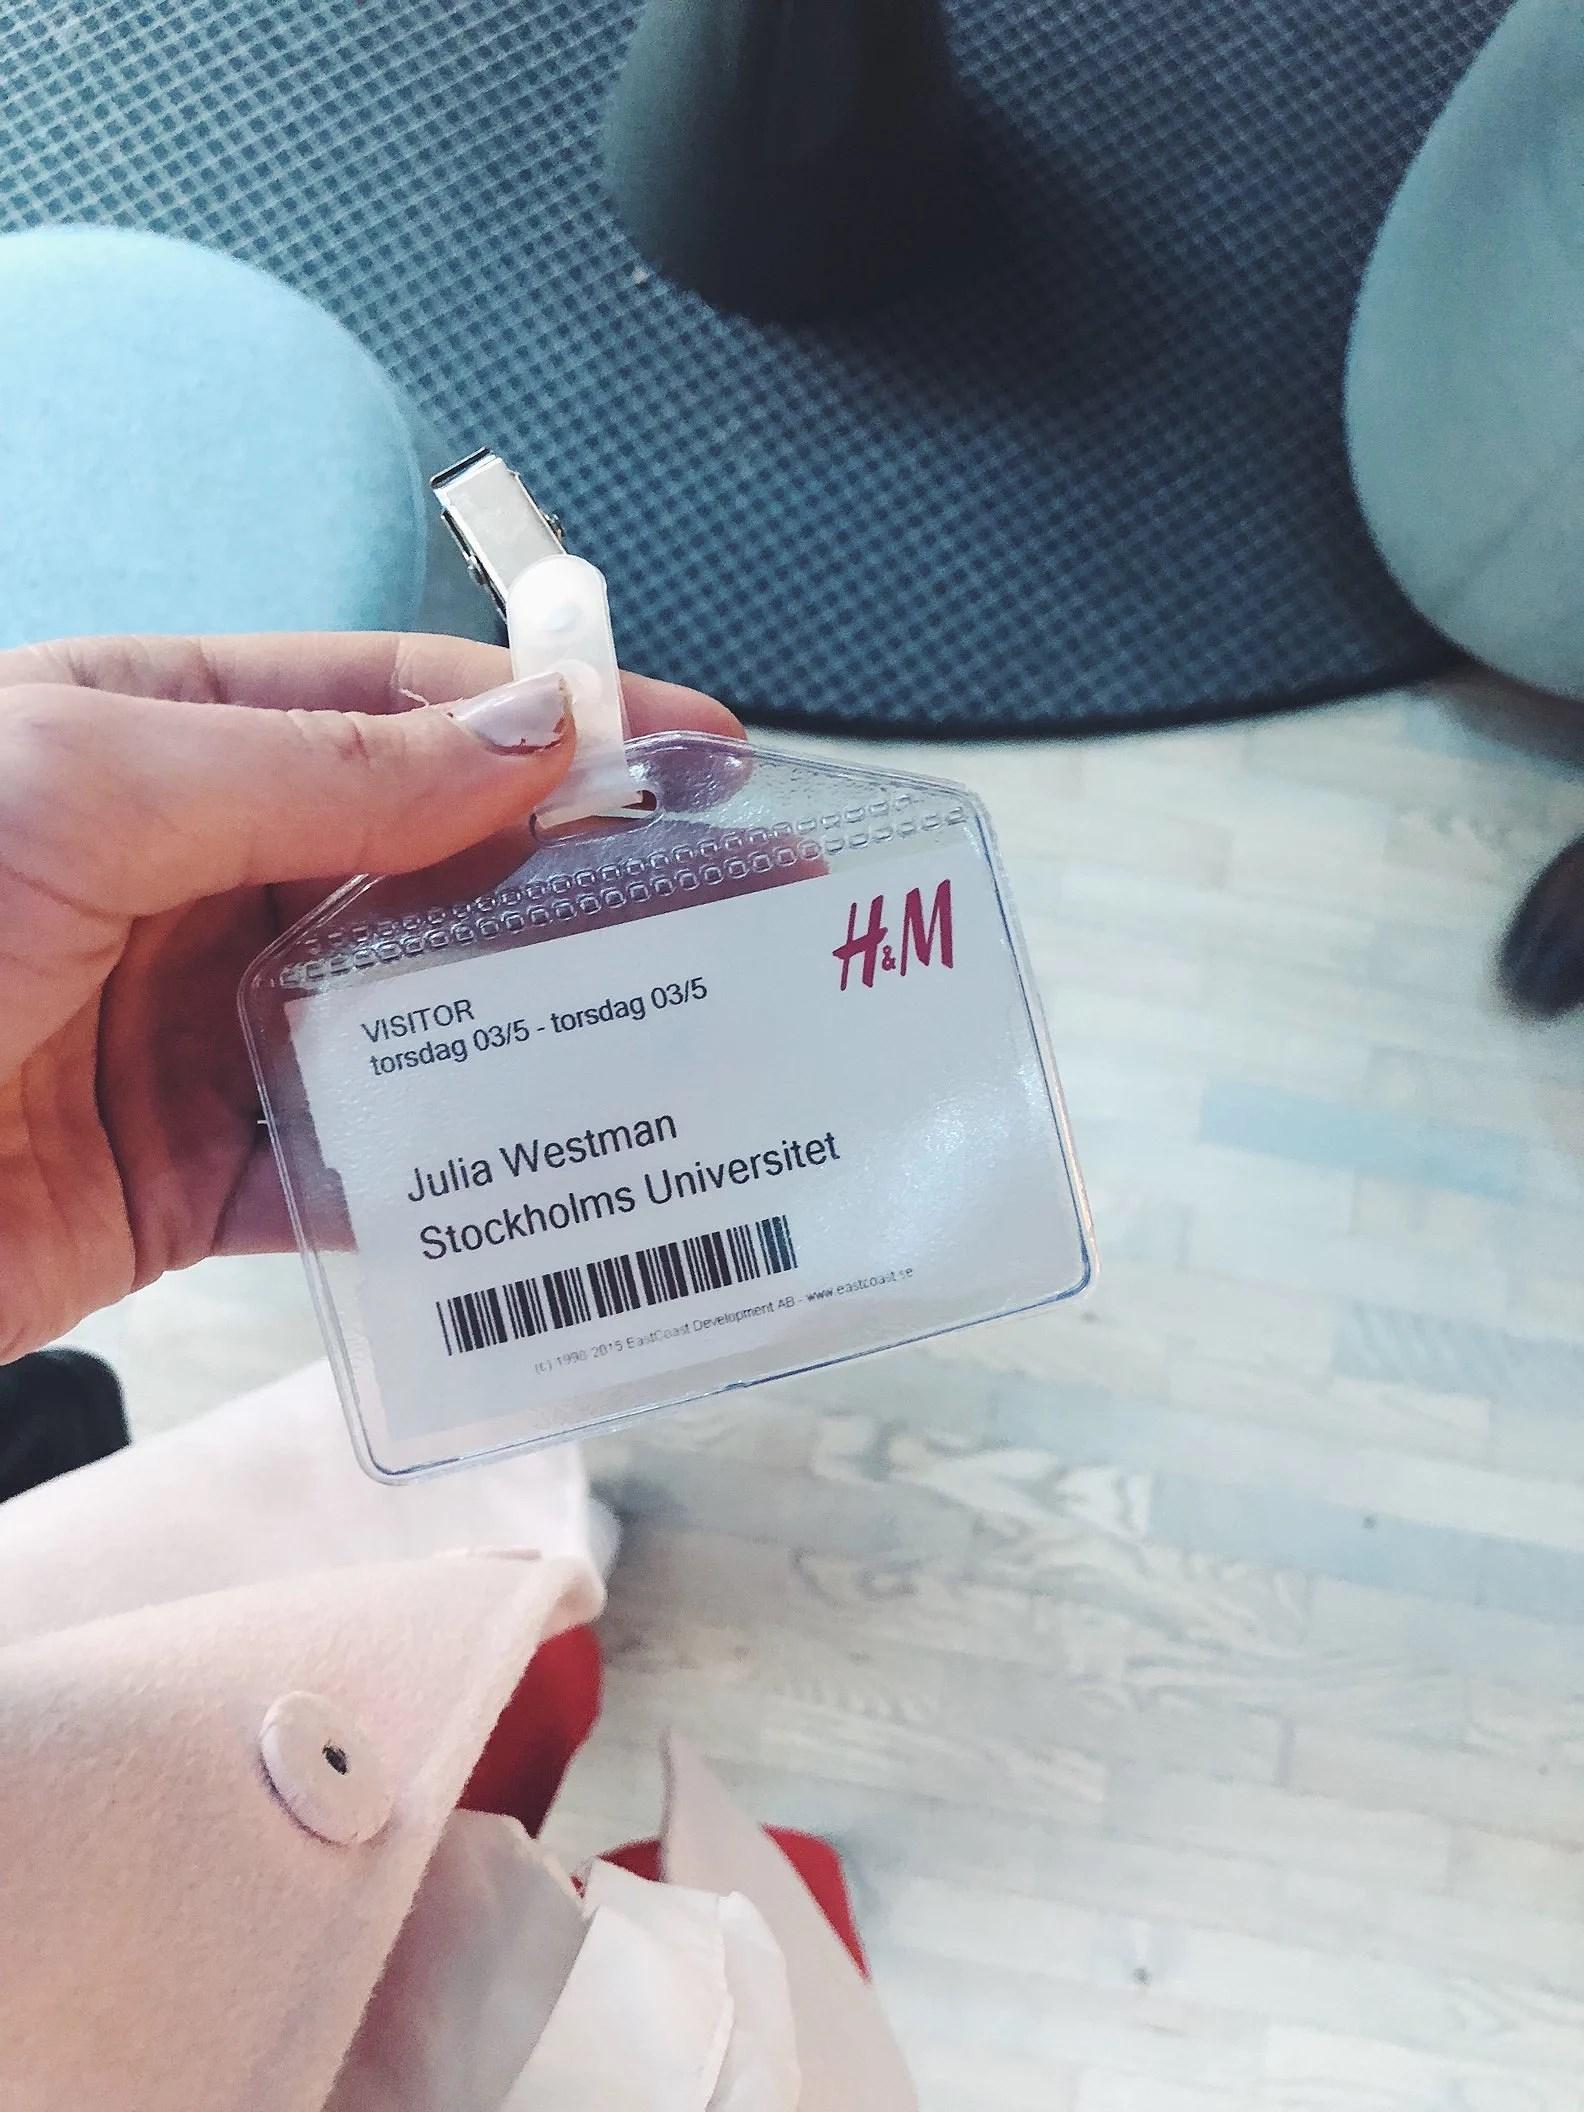 H&M Headoffice